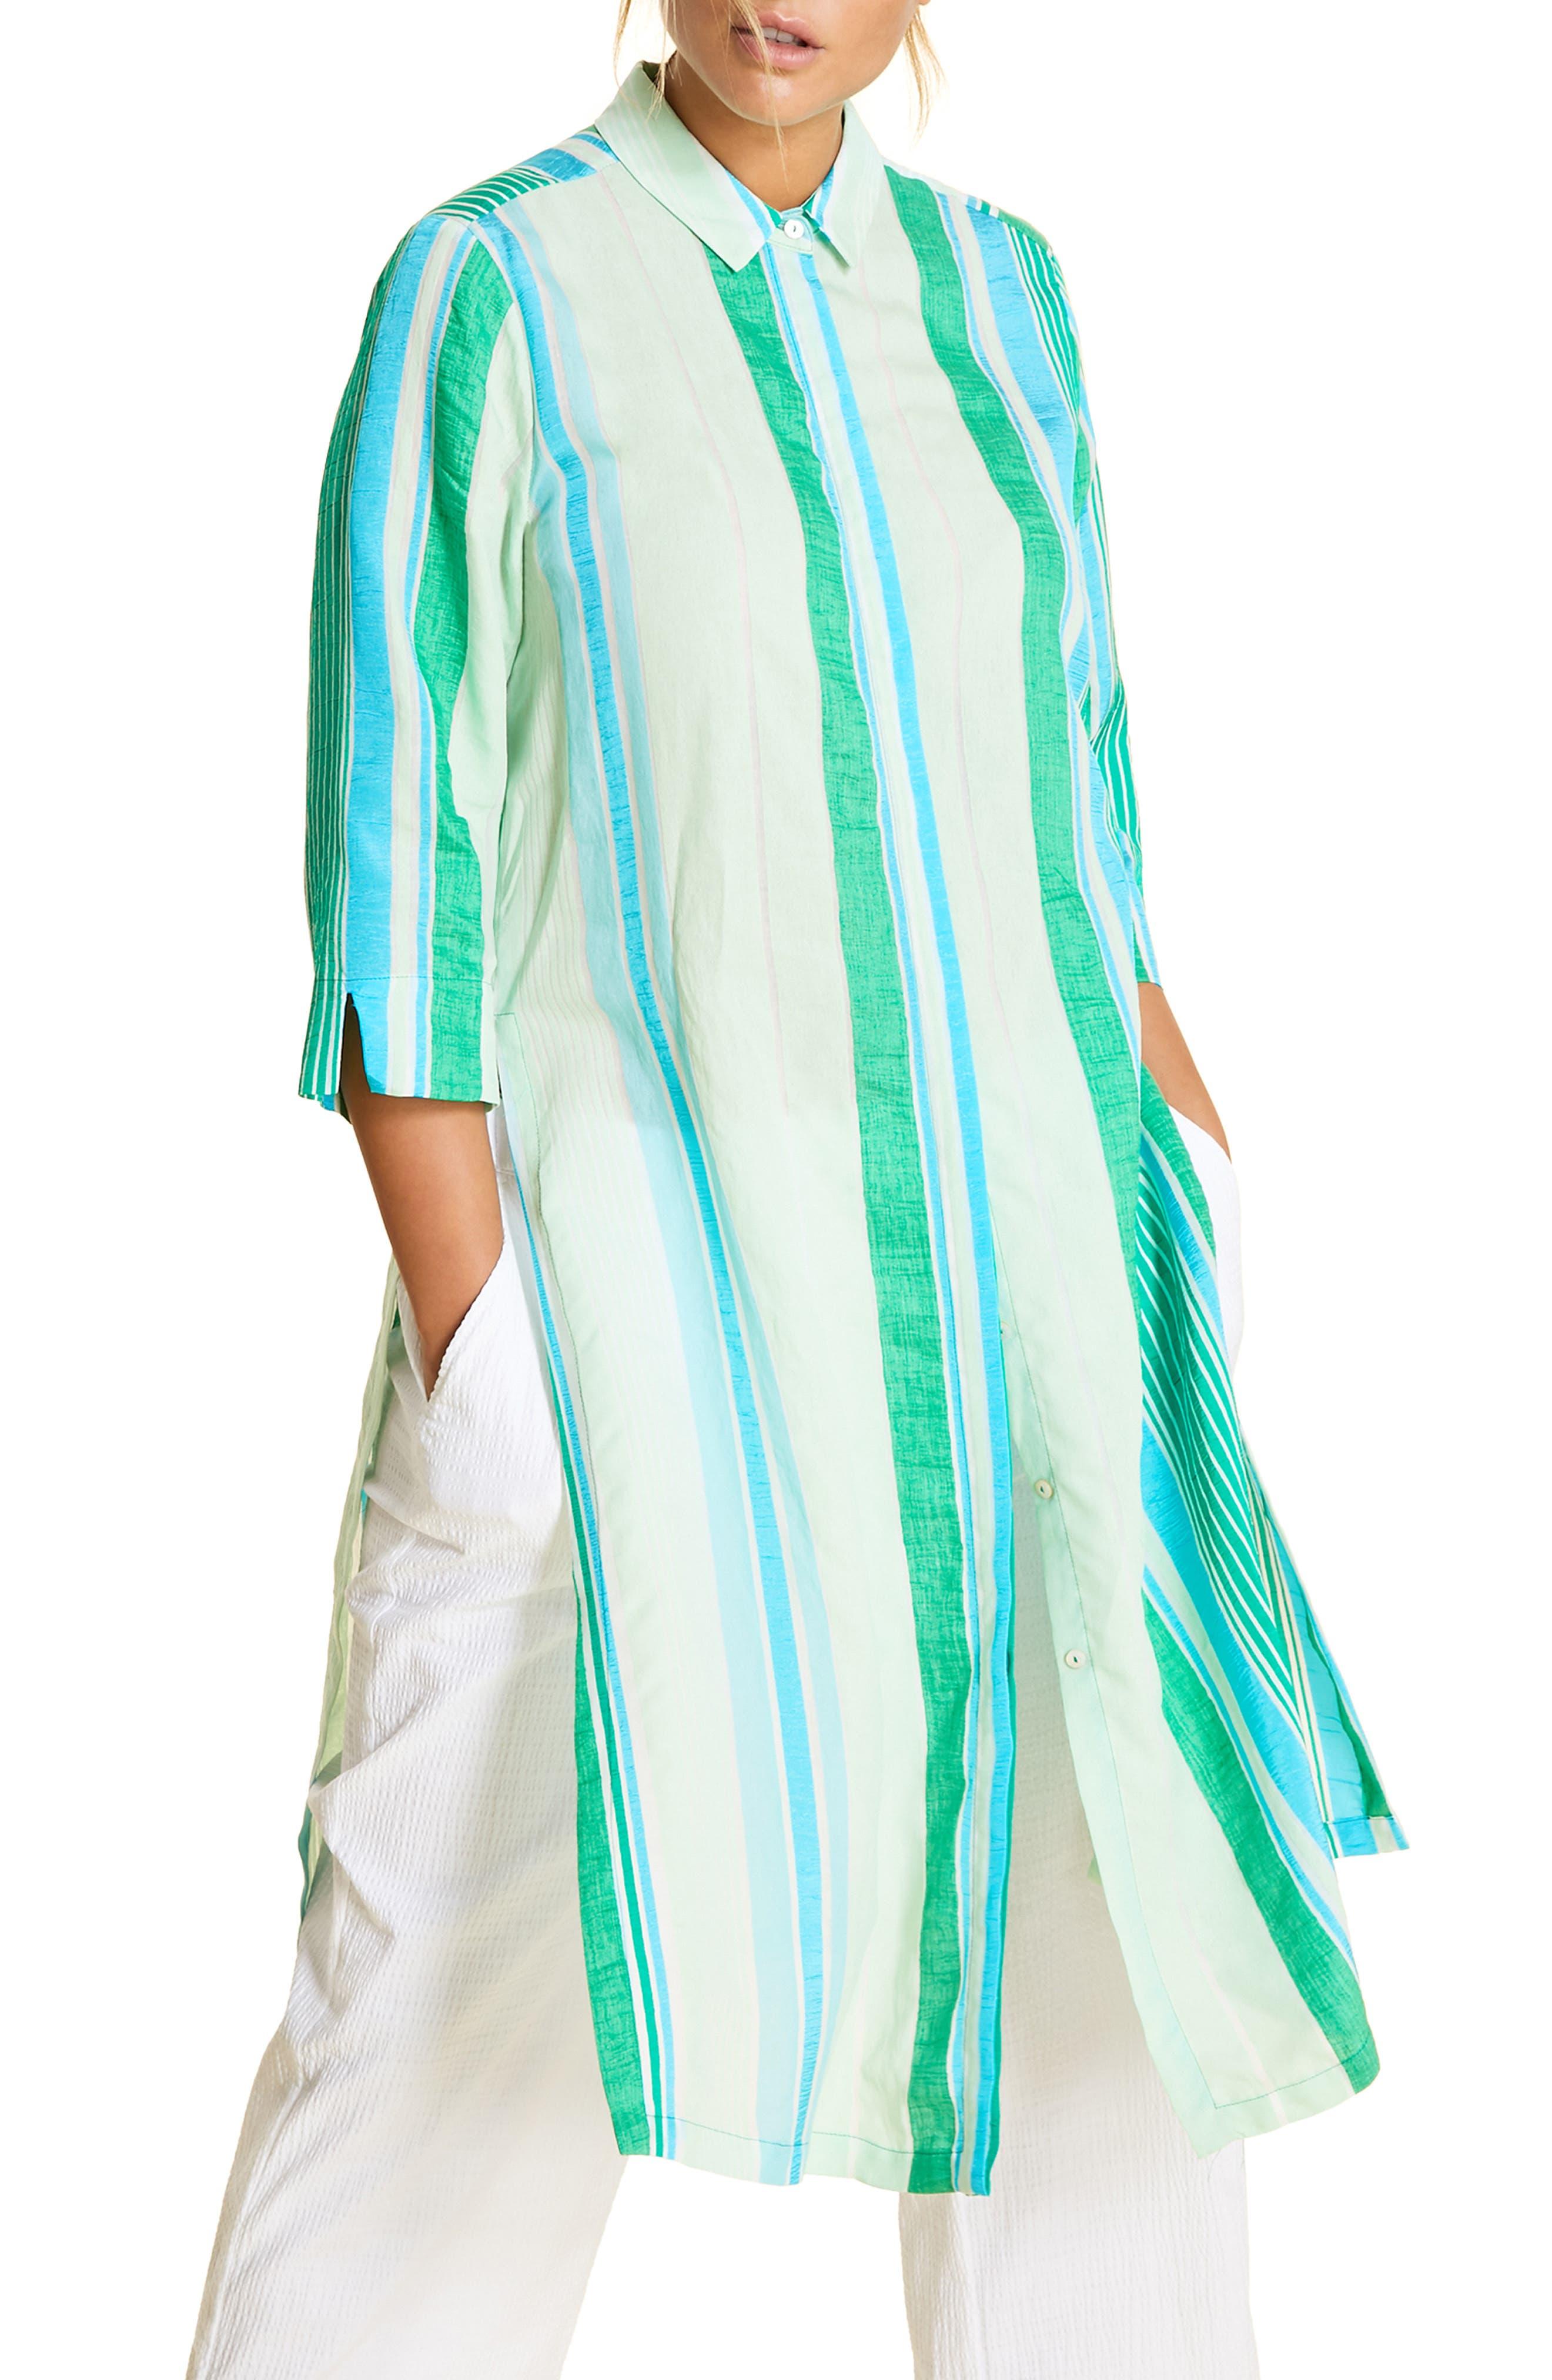 plus size women's marina rinaldi doppiare tunic shirt